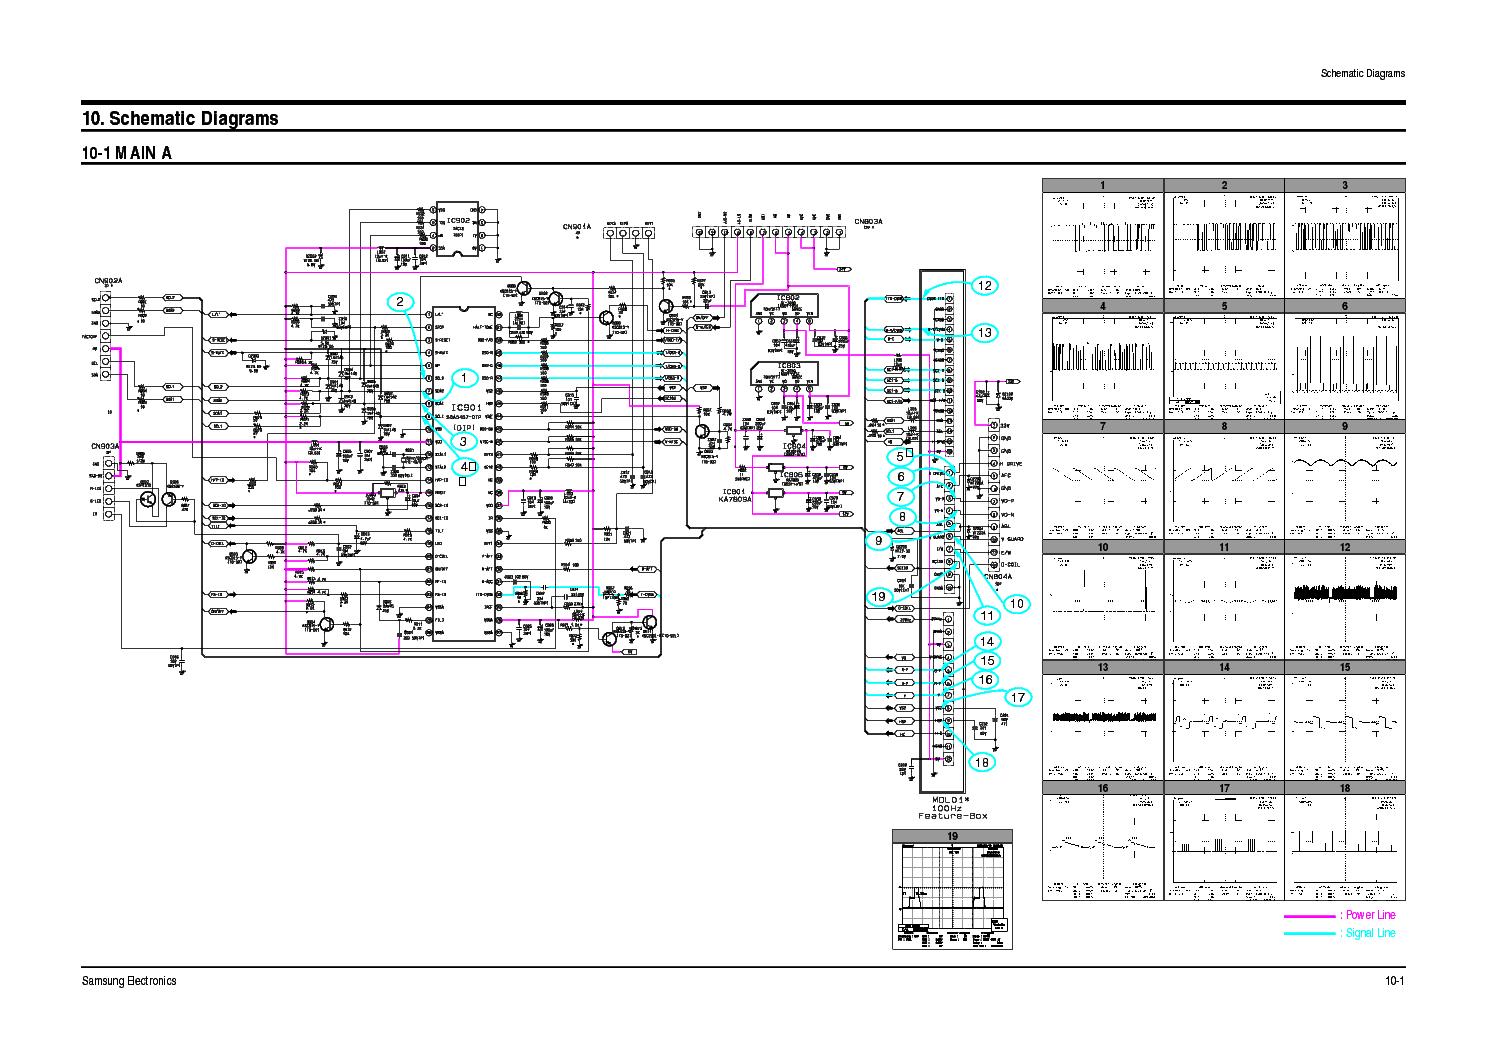 Схема самсунг ск 5339 зр